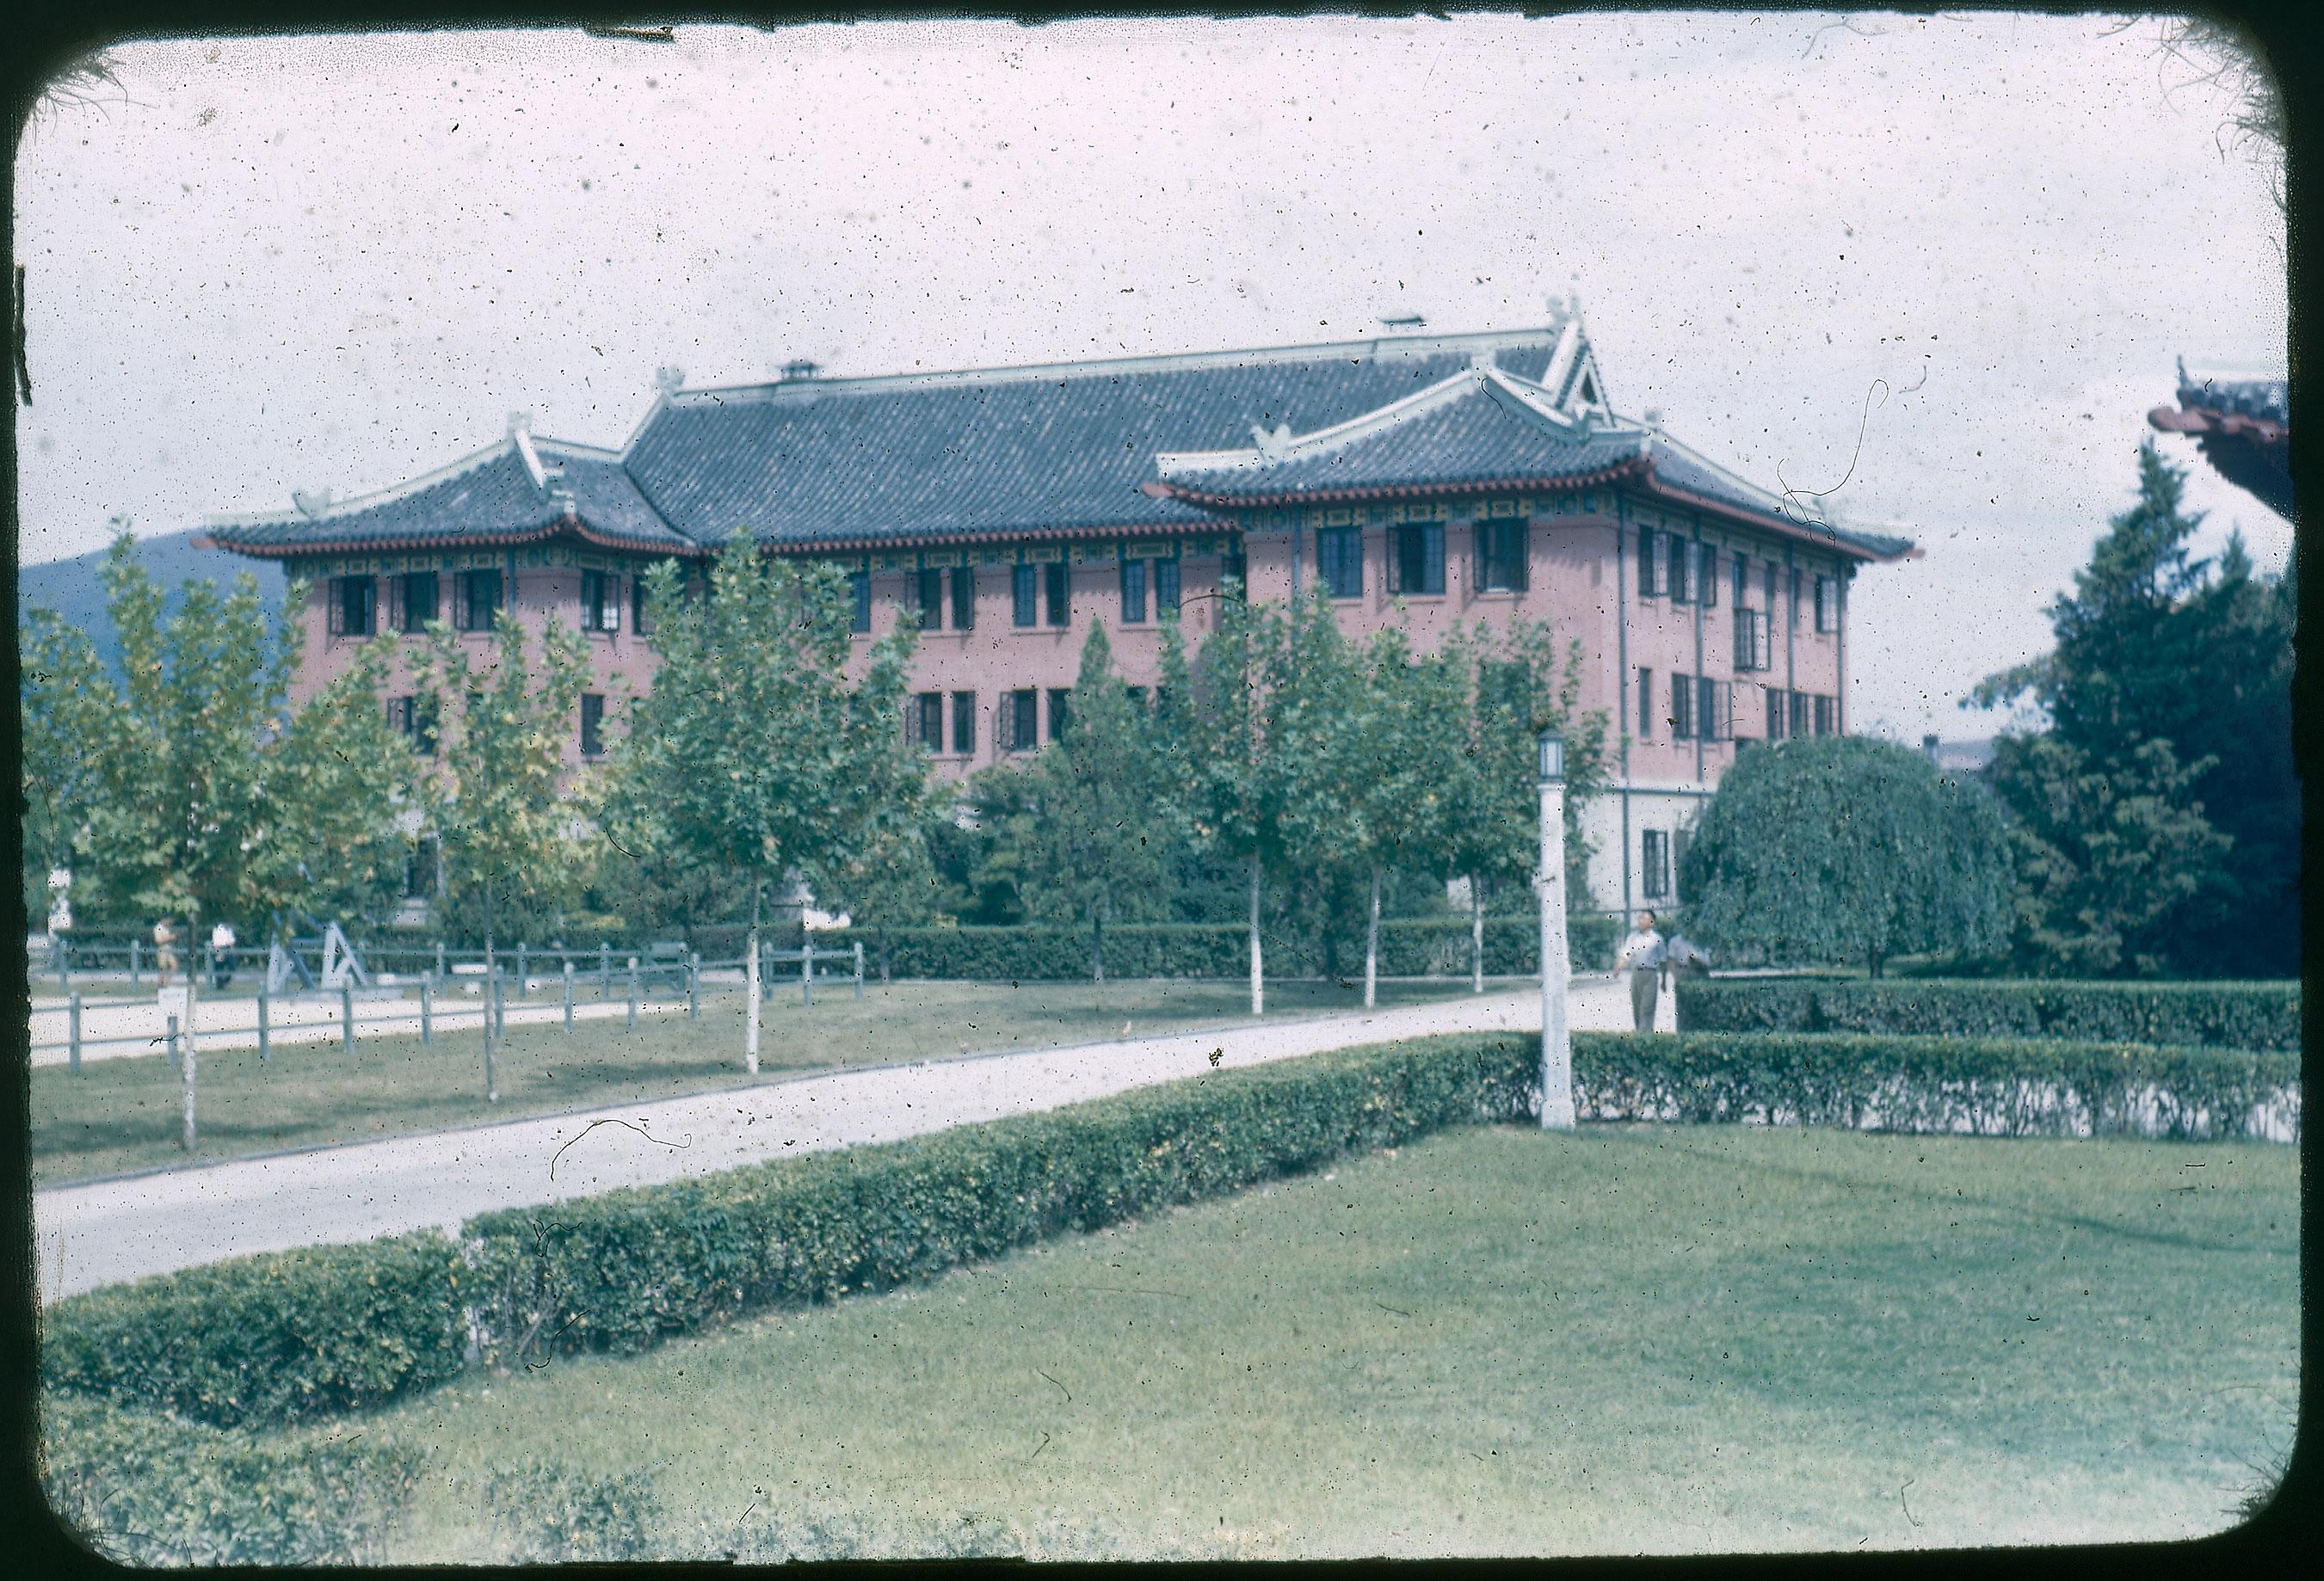 Hiller 09-007: Reddish building with flying eaves in Nanking